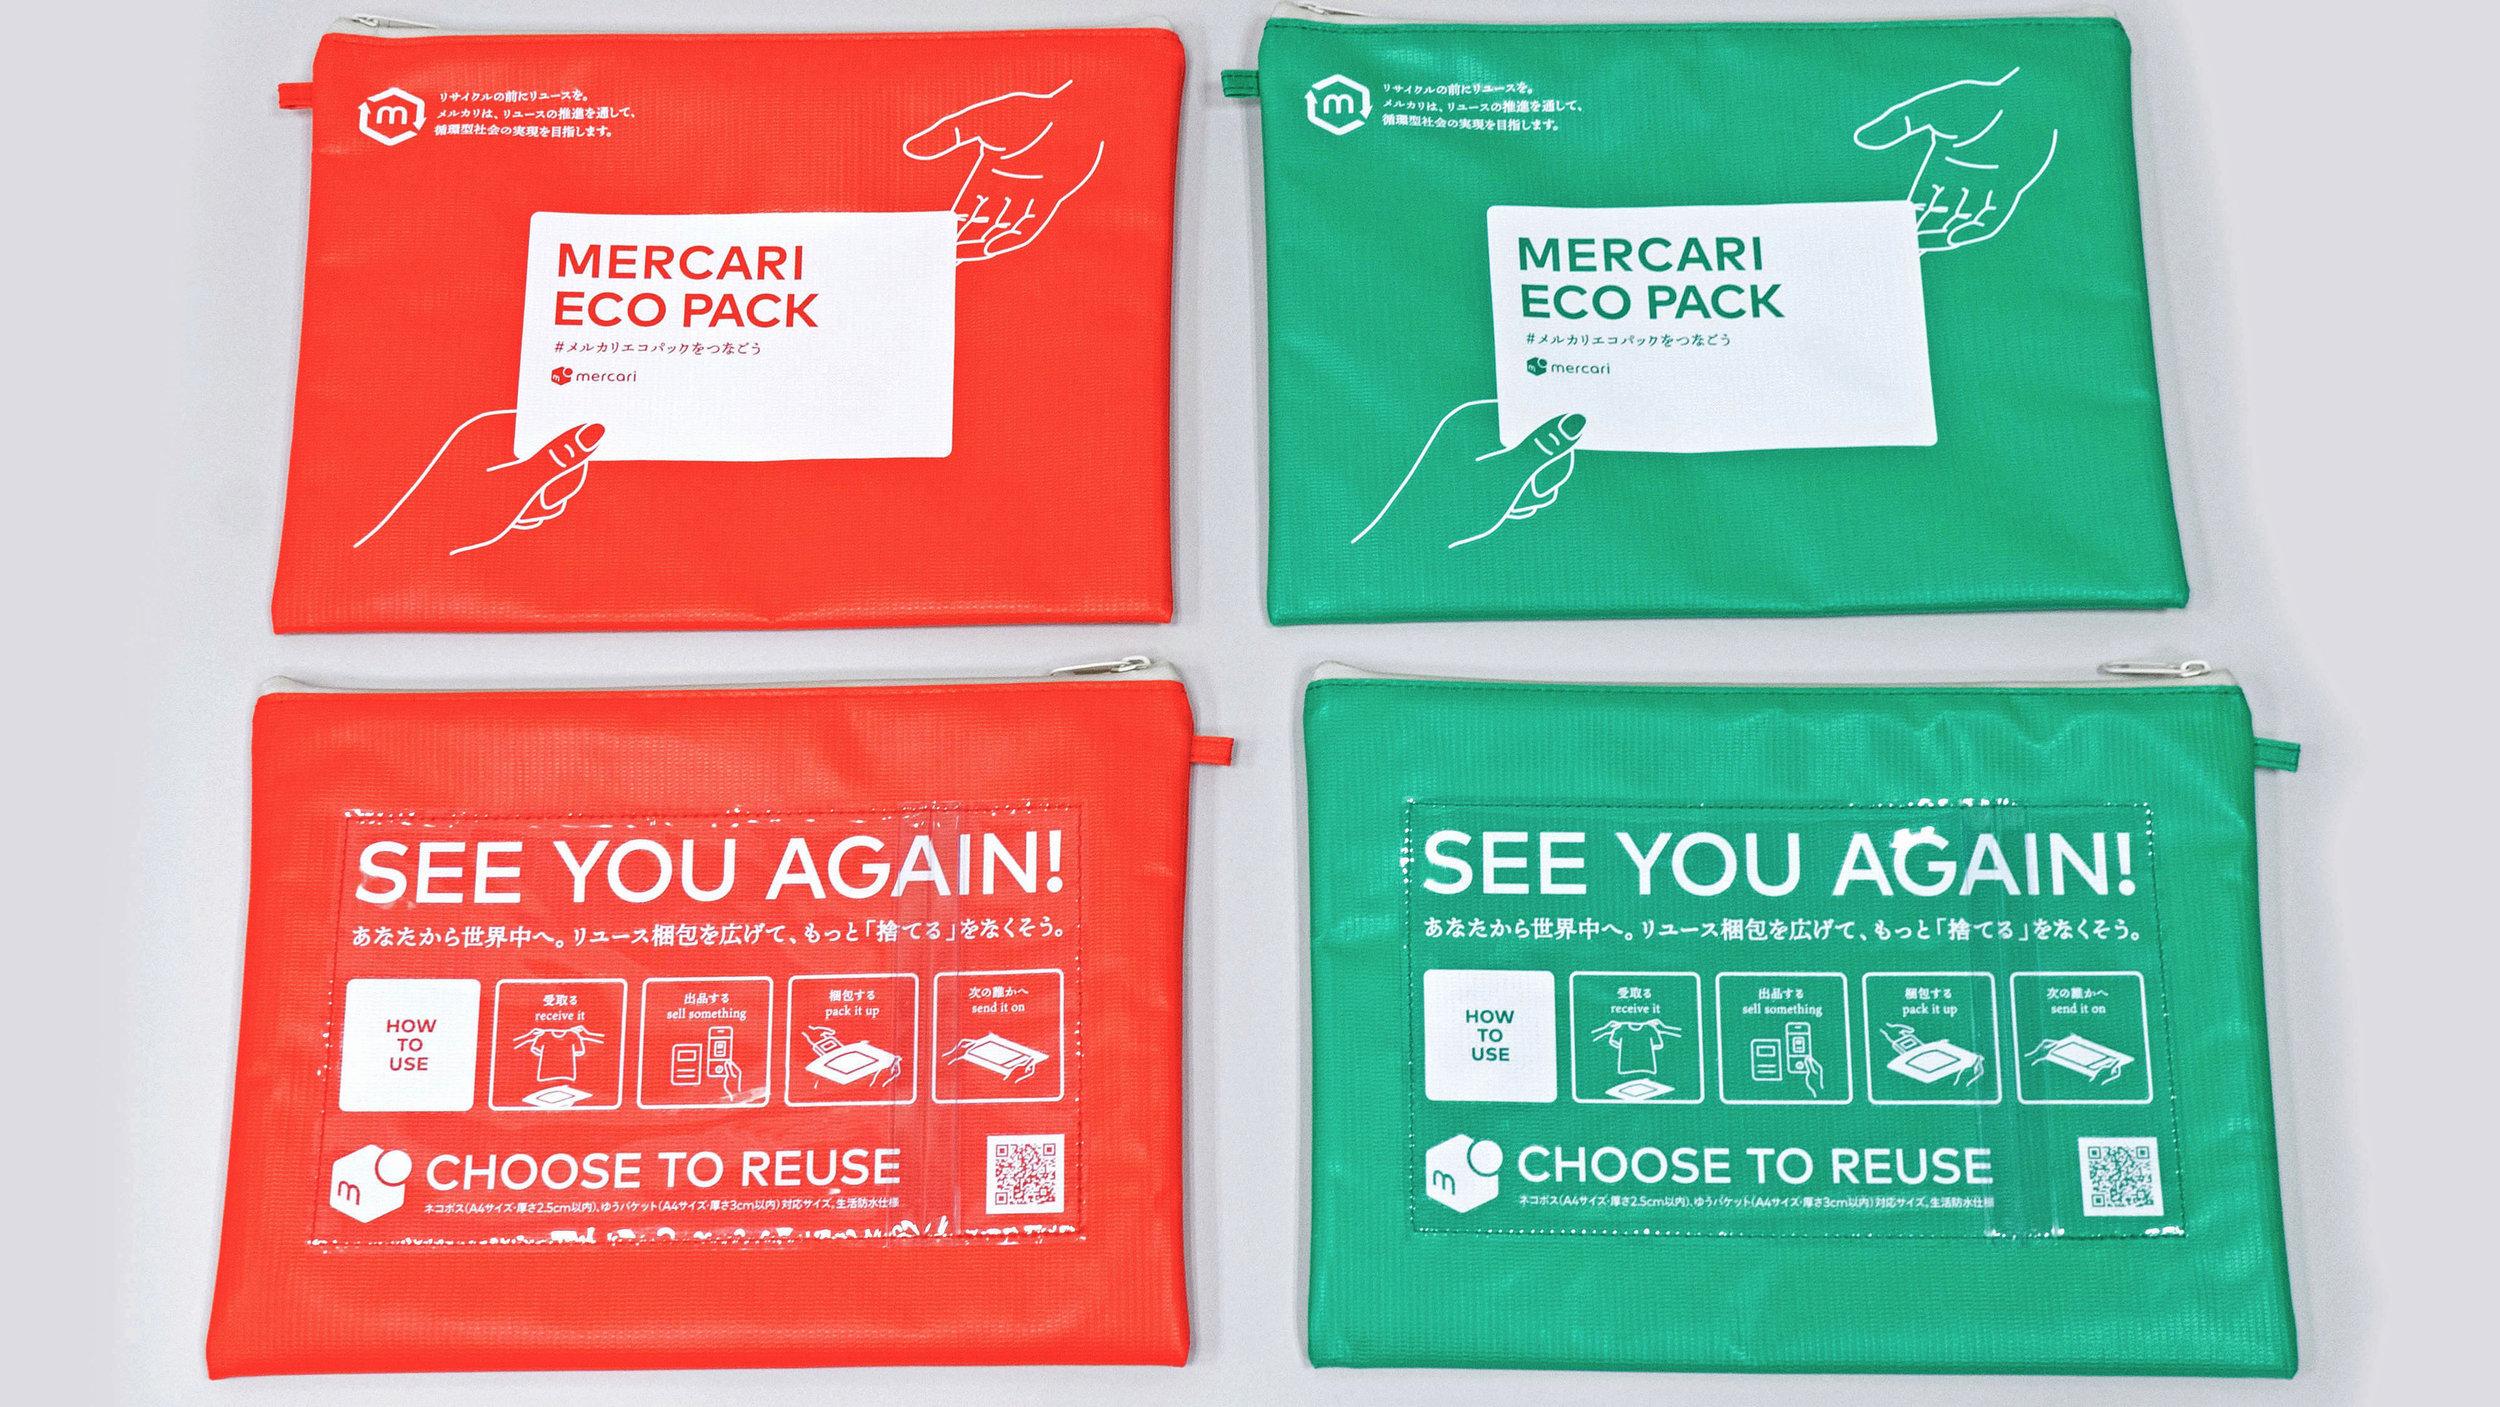 Mercari's new Eco Pack